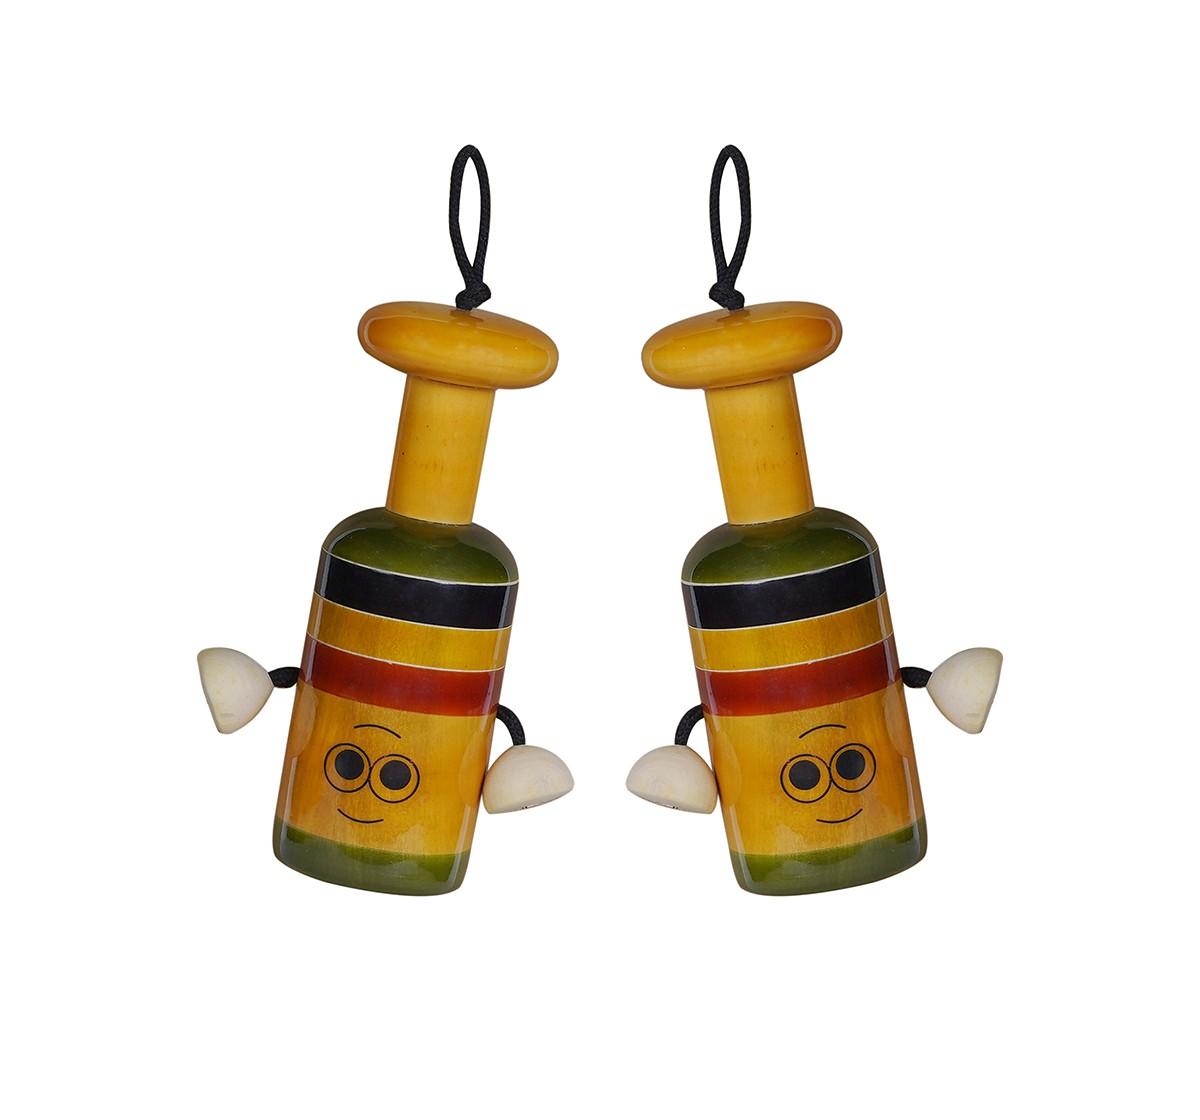 Folktales Handmade Wooden Bell Rattle 2 Wooden Toys for Kids age 0M+